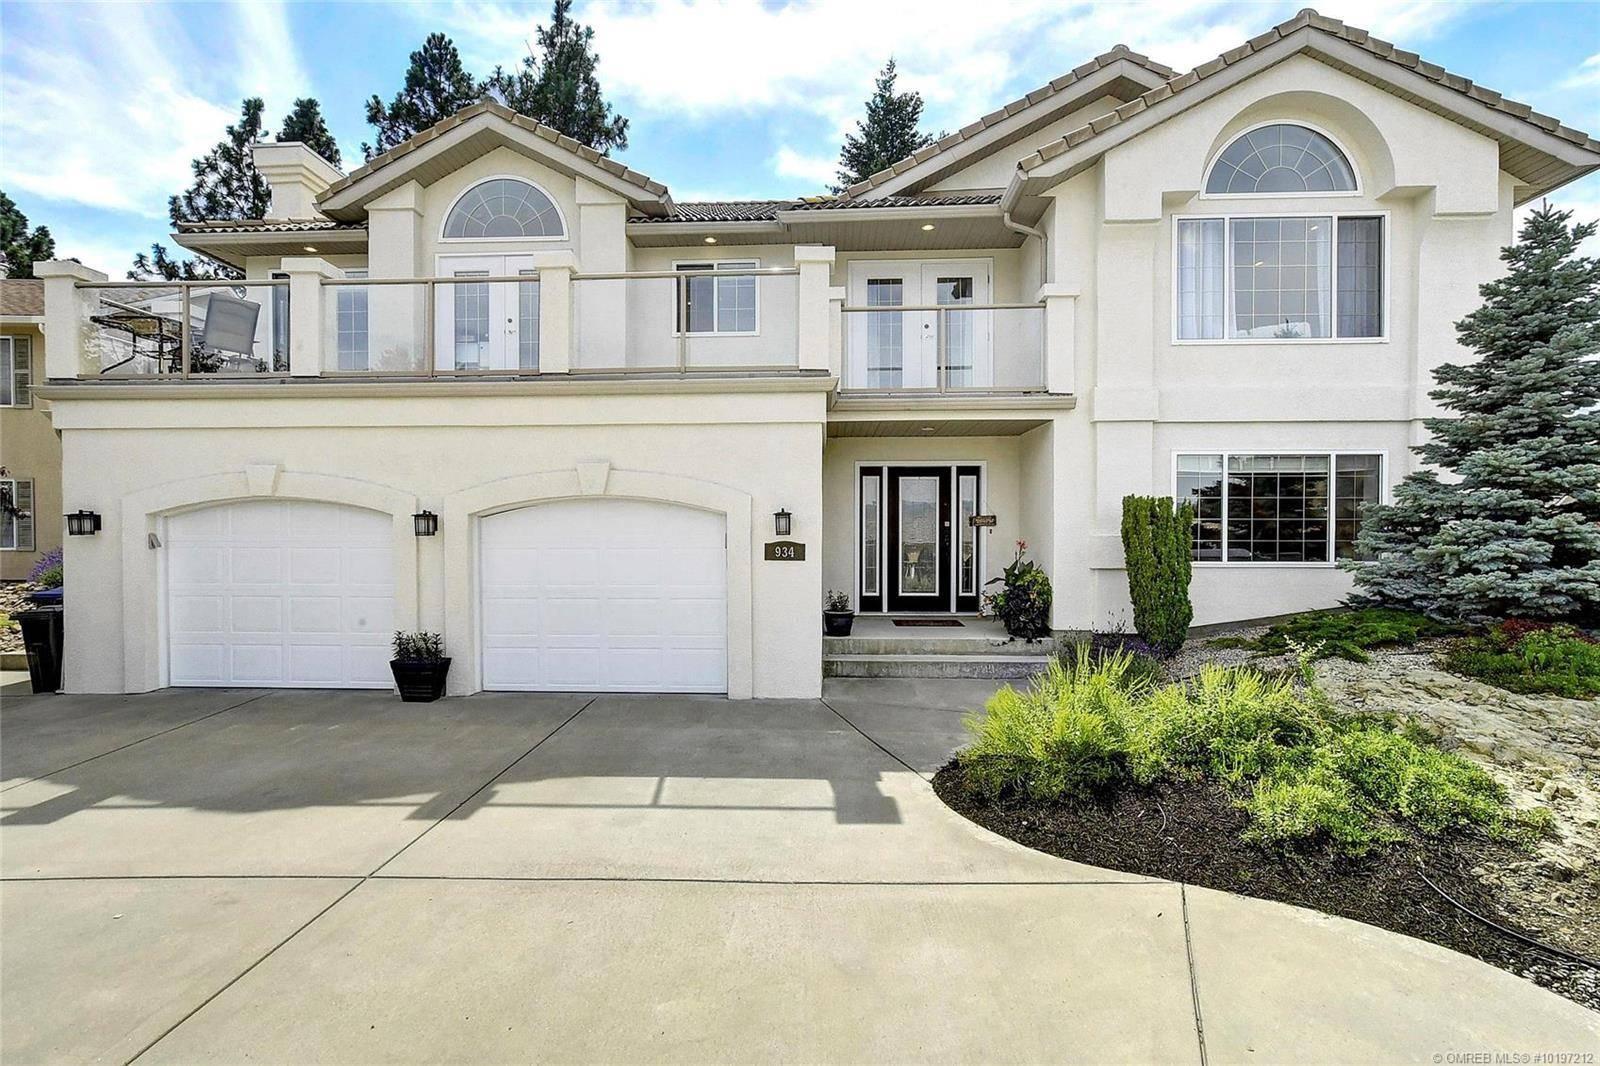 House for sale at 934 Stikine Ct Kelowna British Columbia - MLS: 10197212